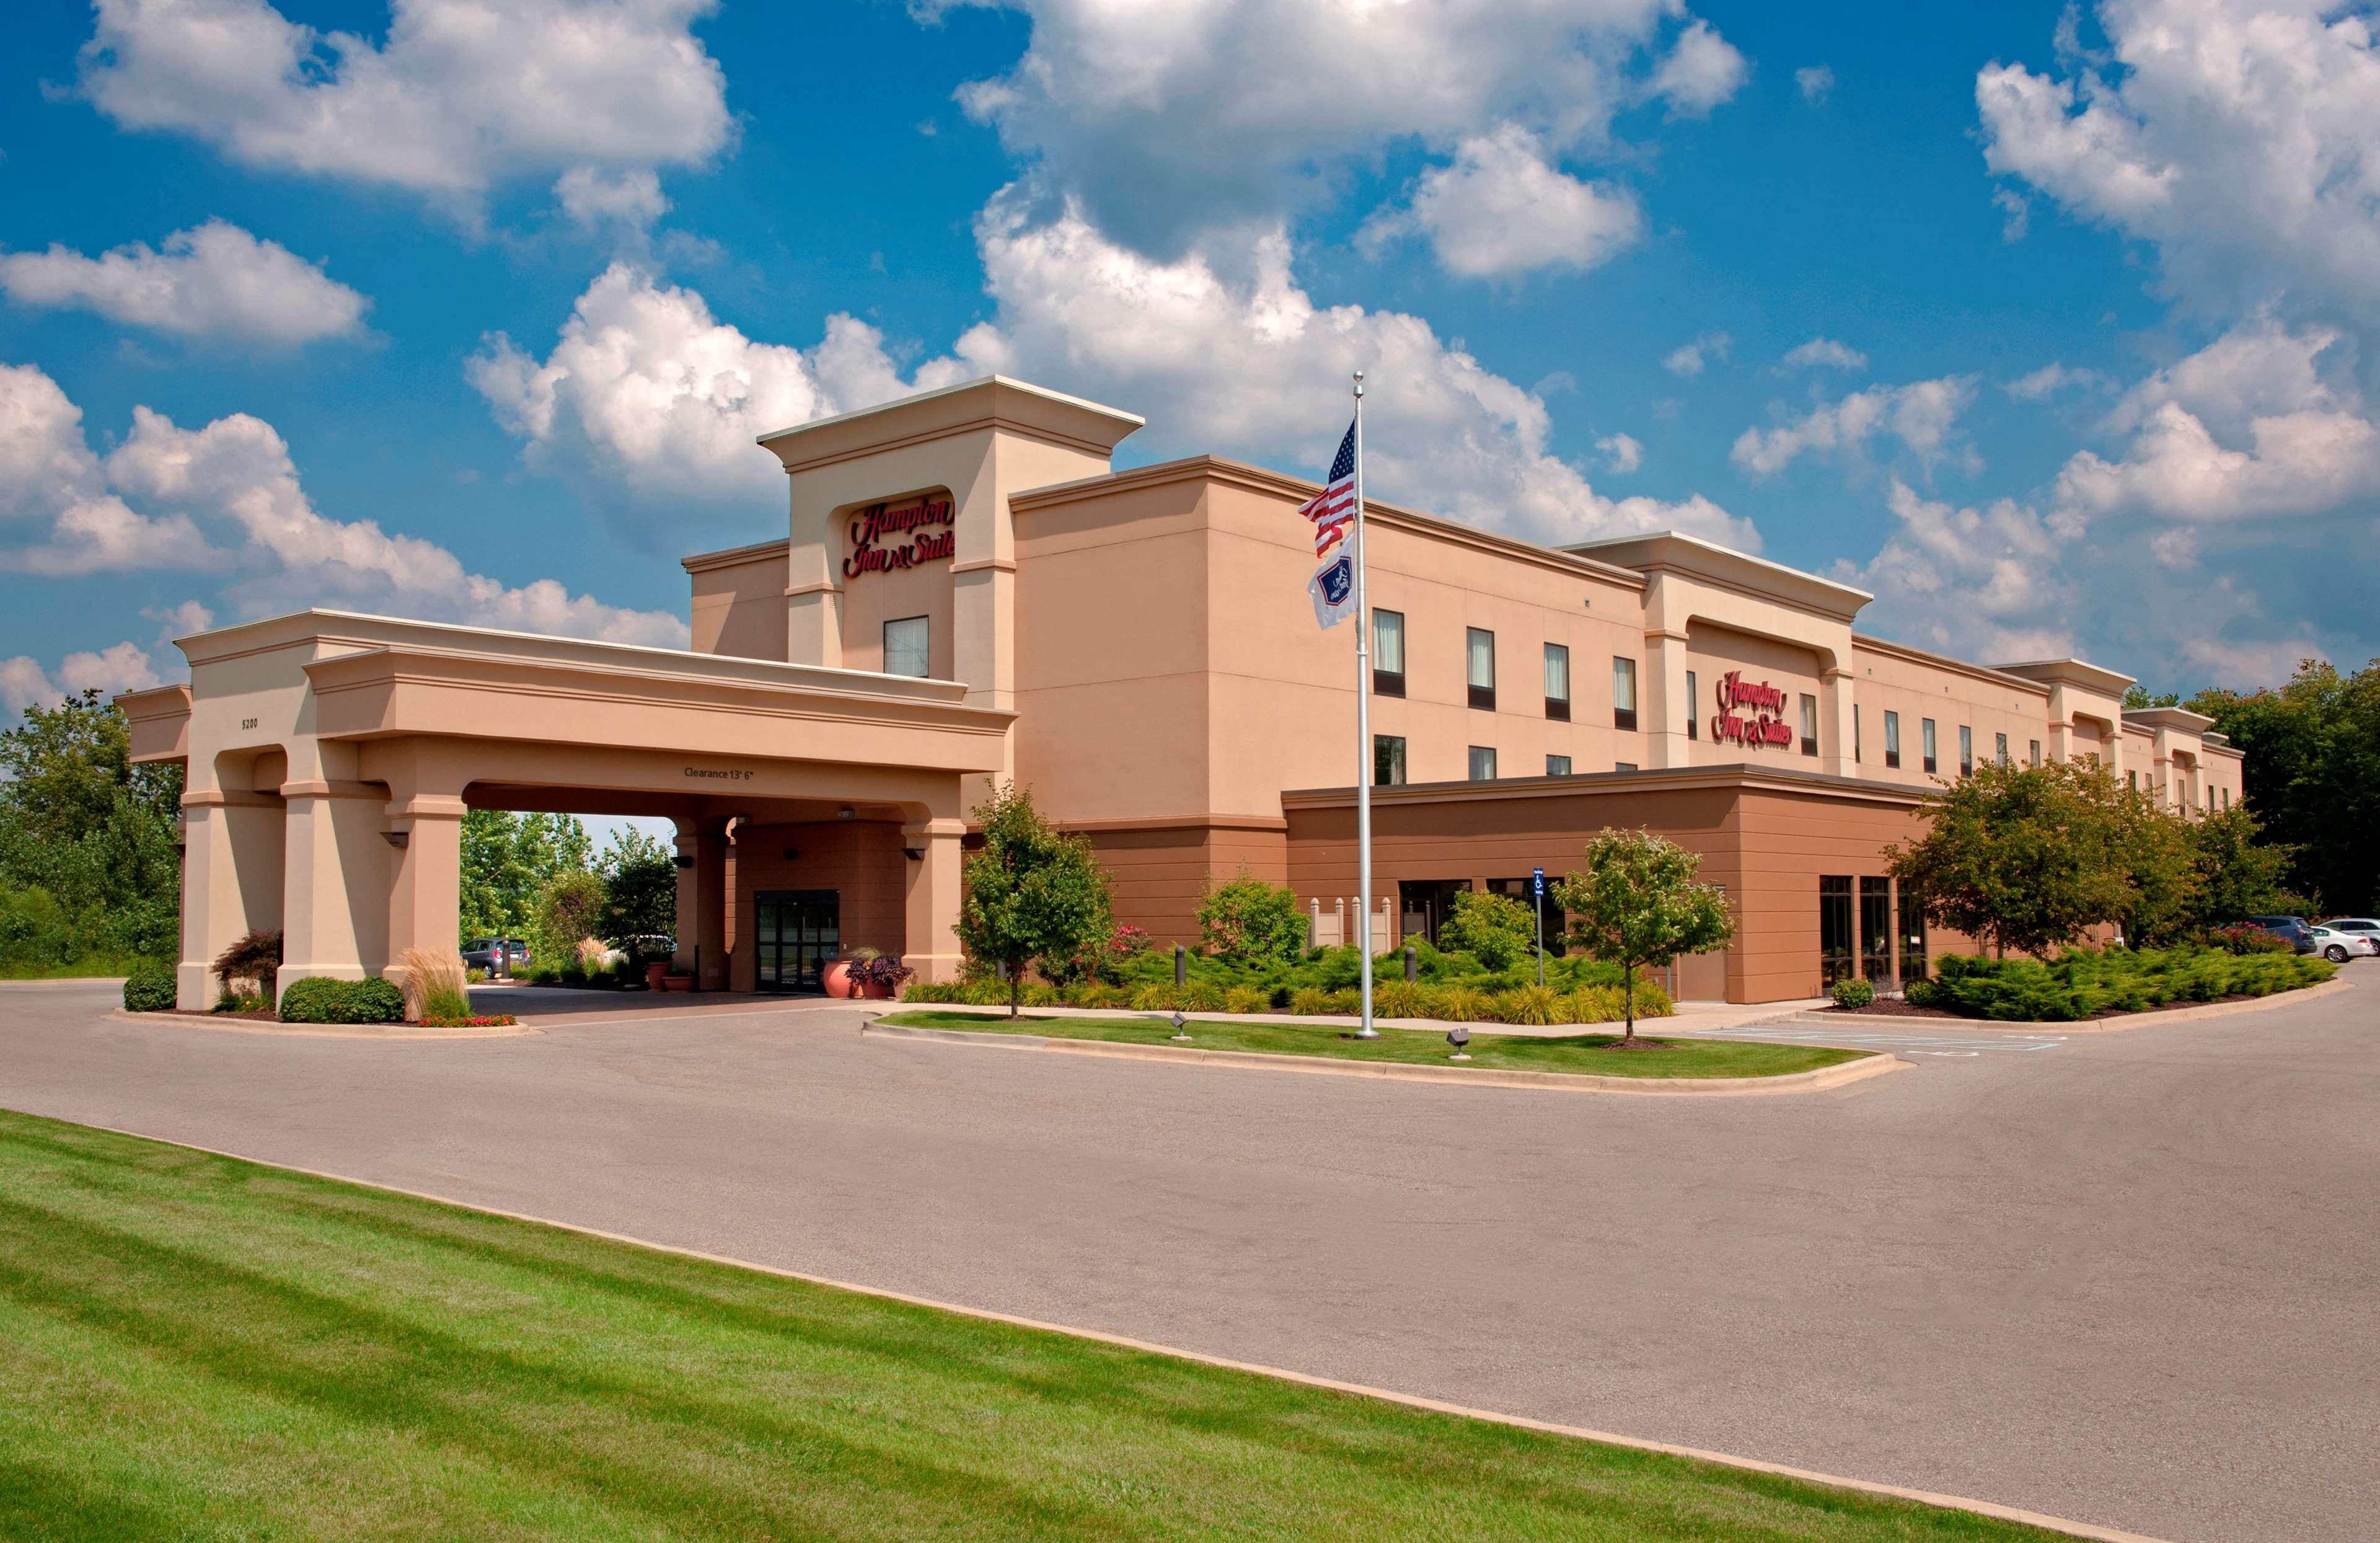 Hampton Inn & Suites Grand Rapids-Airport 28th St image 0